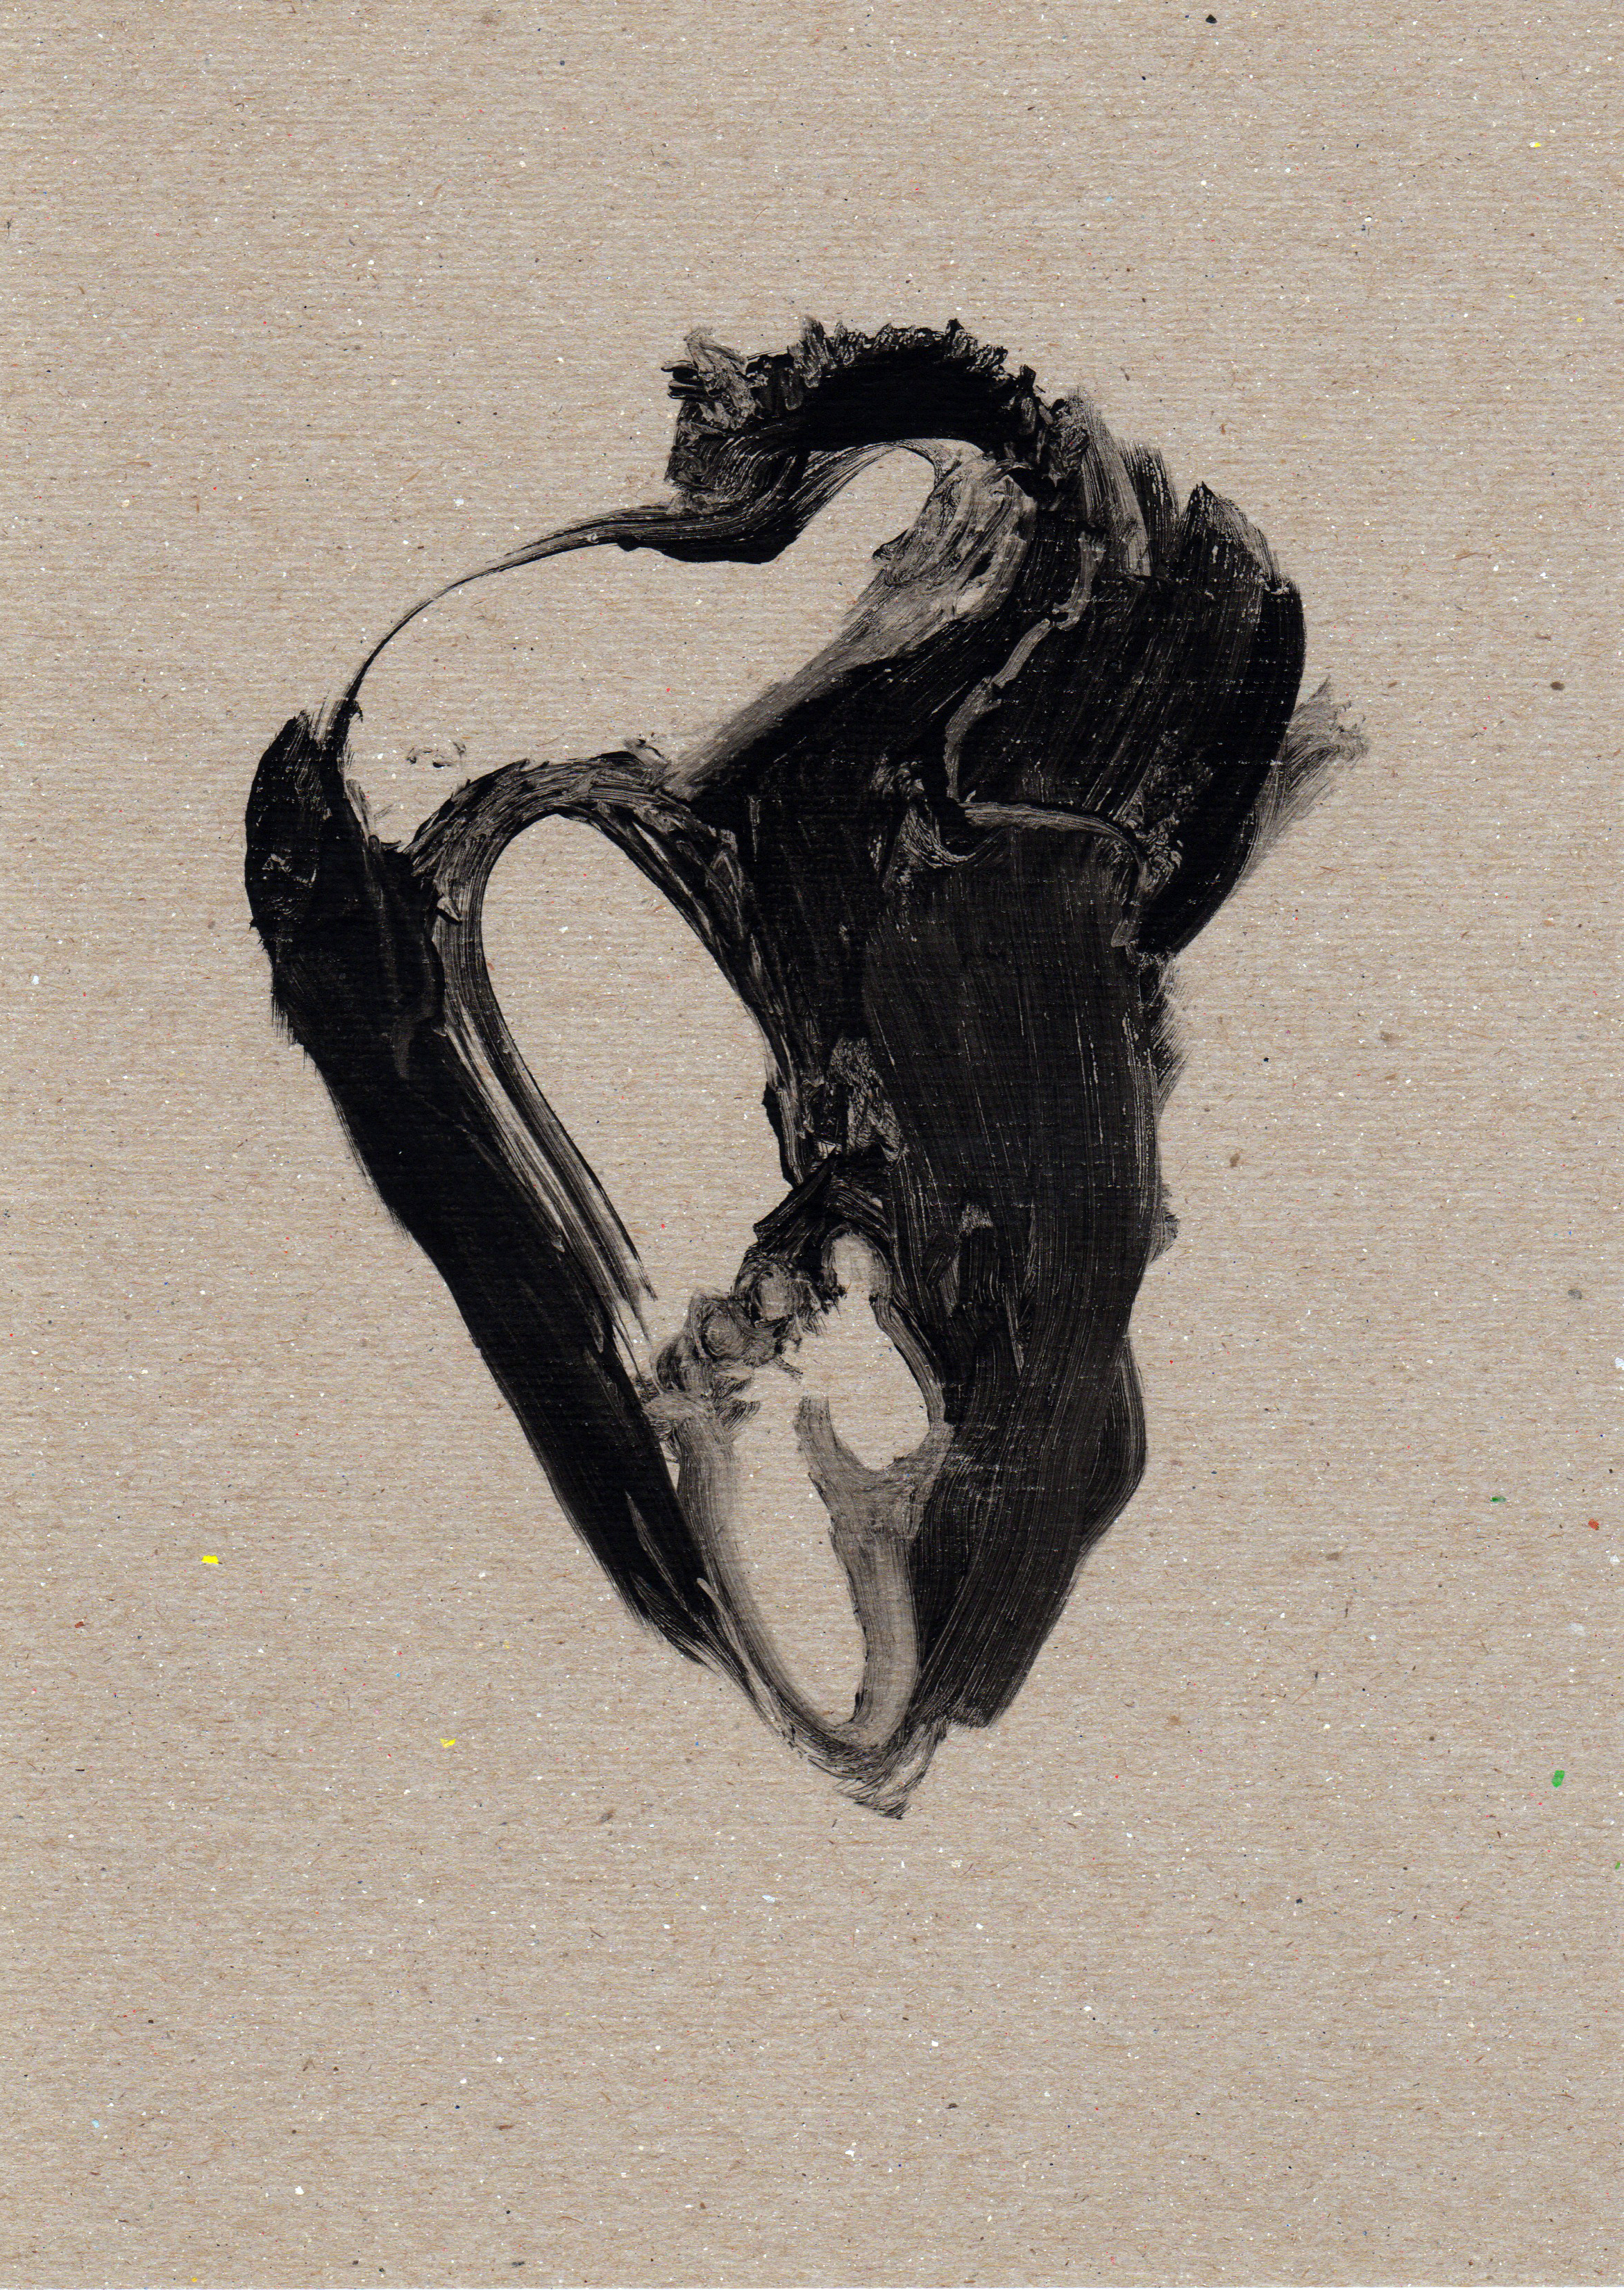 Untitled Wind Thigh, 2014, gelatin monotype, 11x8 inches